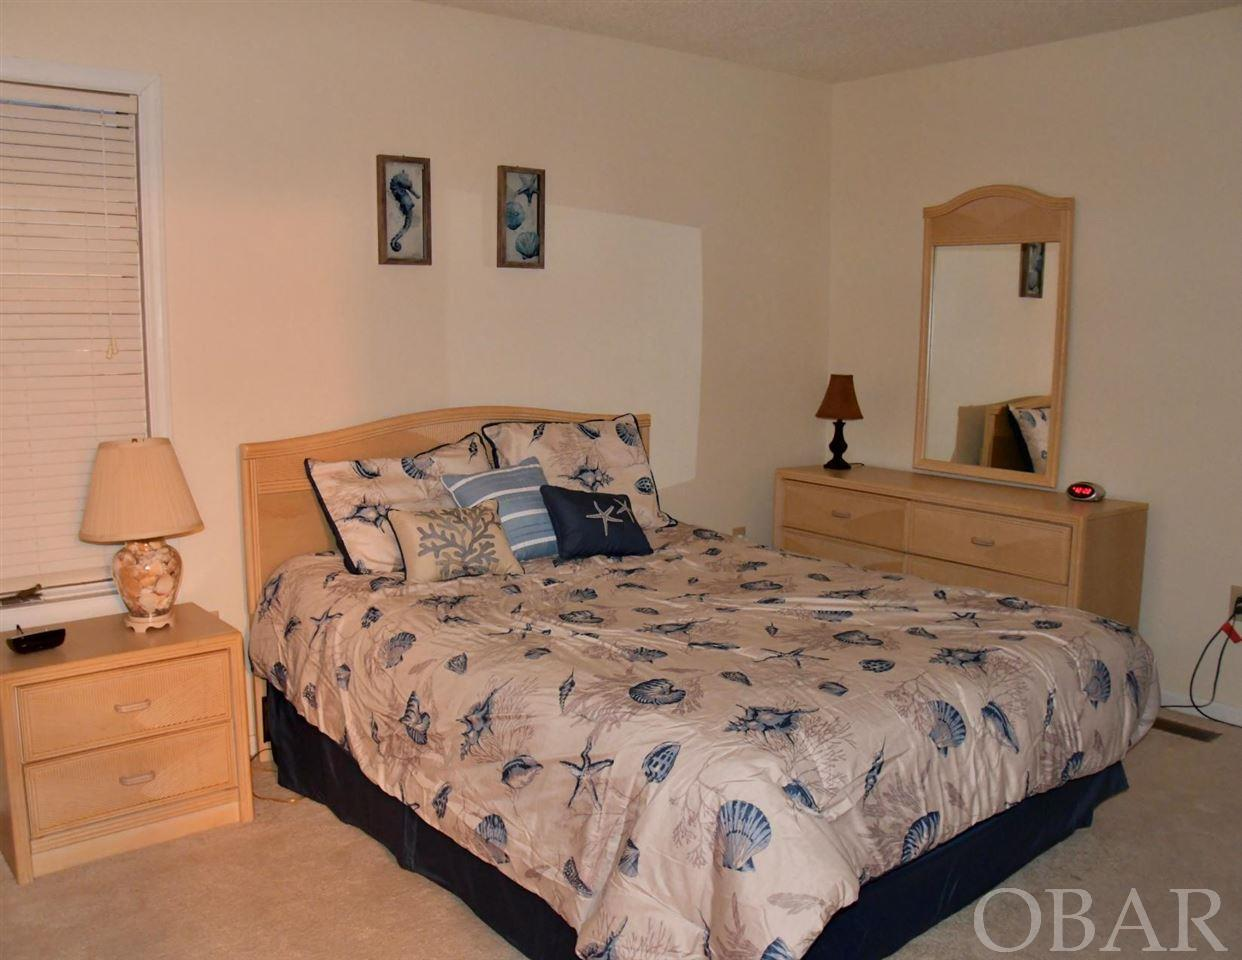 636 Staysail Crescent,Corolla,NC 27927,4 Bedrooms Bedrooms,3 BathroomsBathrooms,Residential,Staysail Crescent,94611